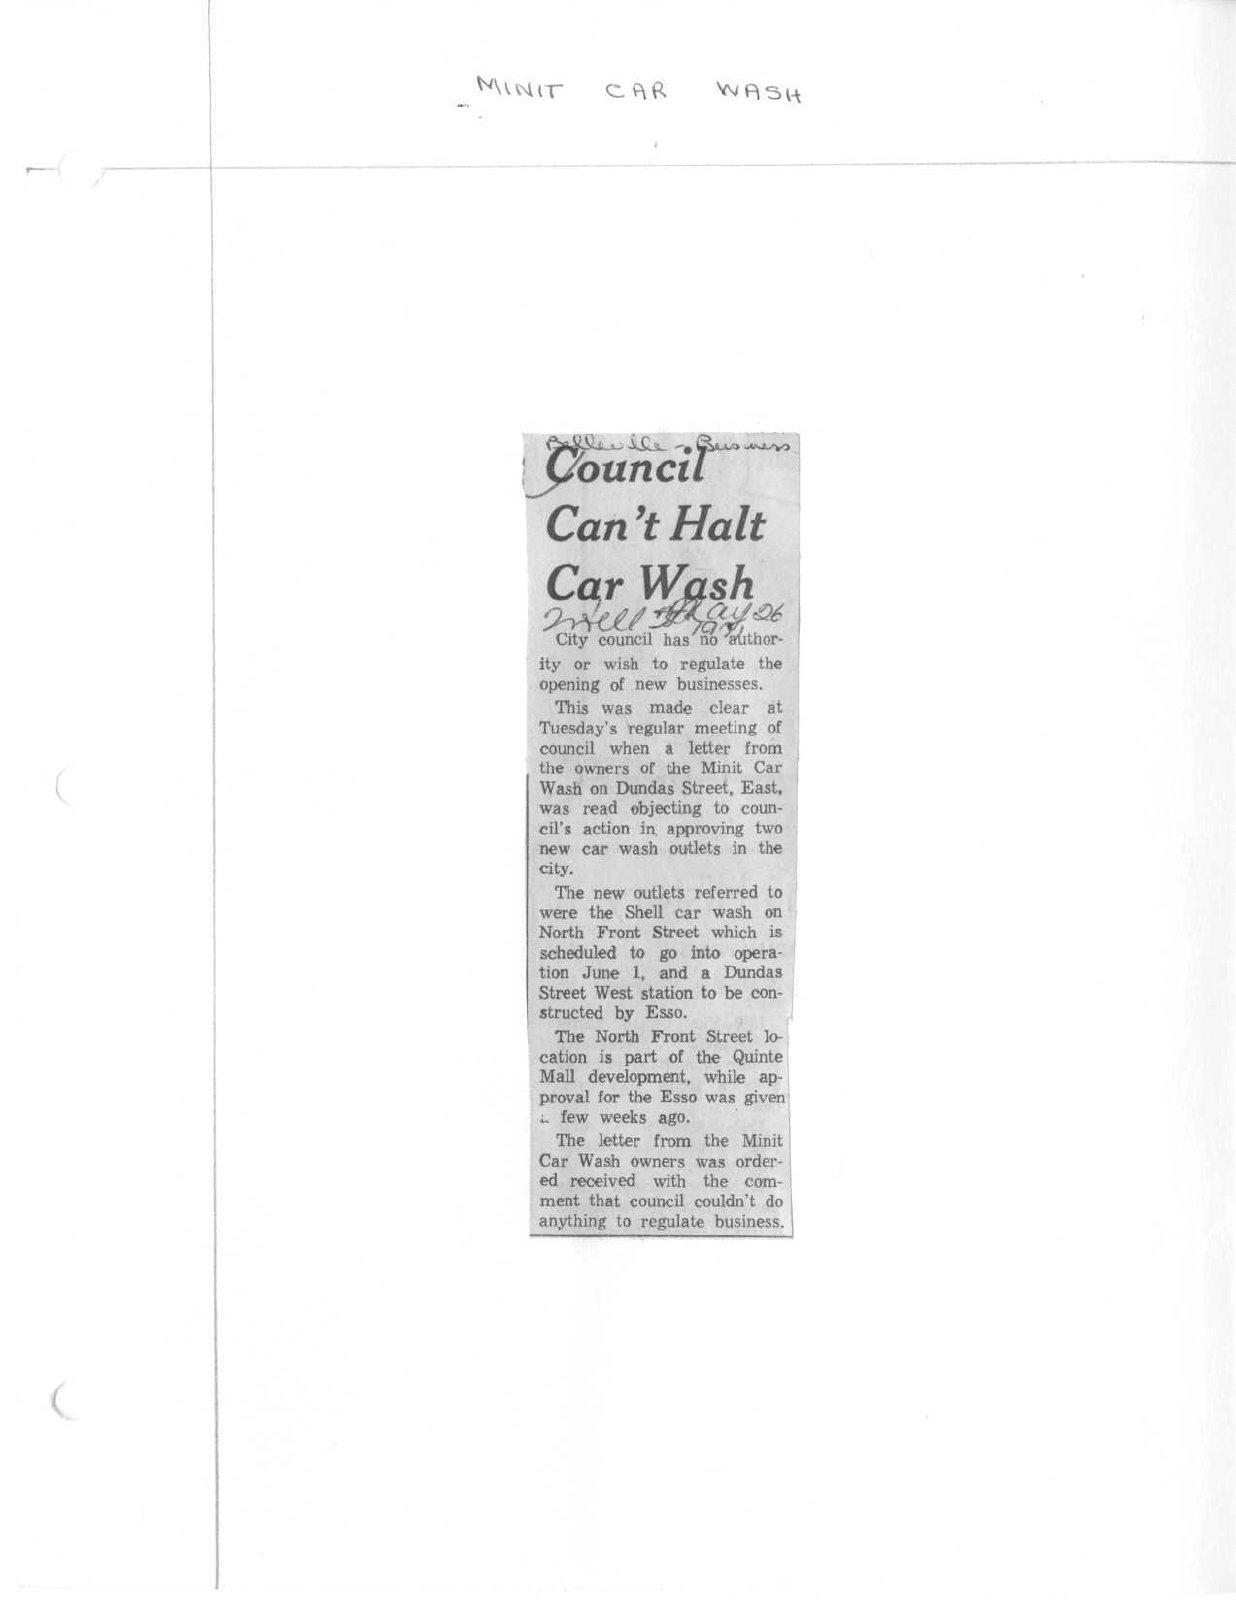 Council Can't Halt Car Wash